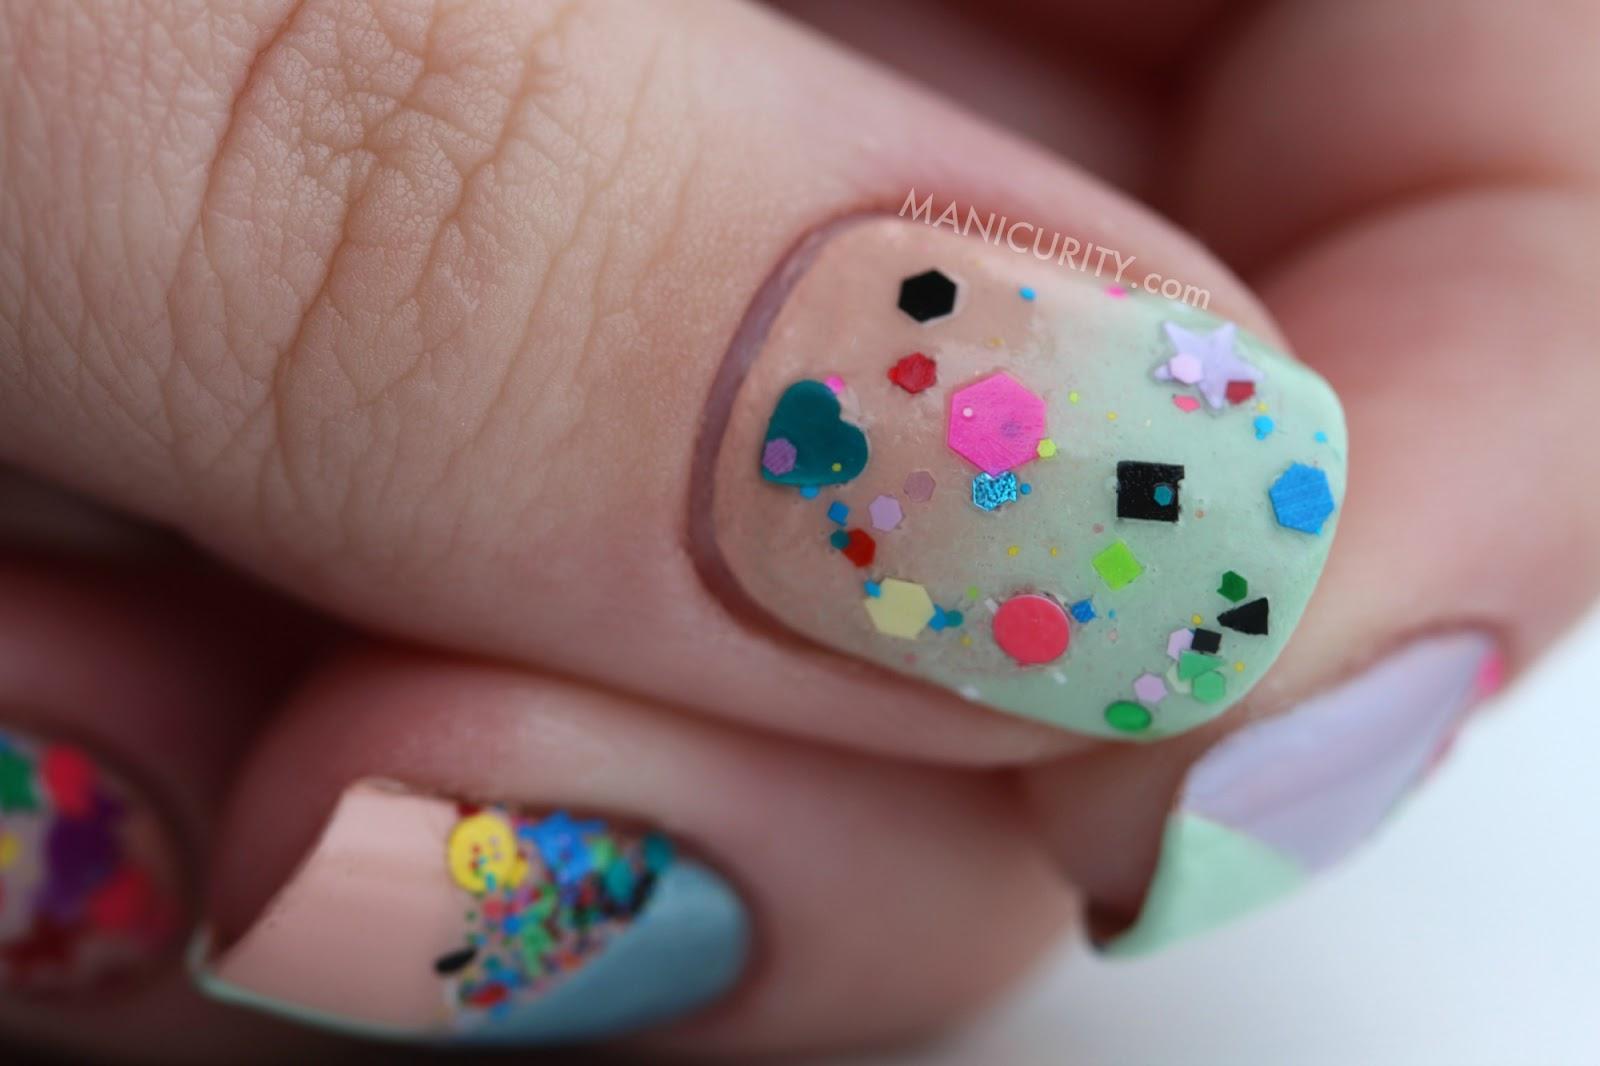 The Digit-al Dozen: Twenty-Teens Colorblocked Tape Mani + Candy Lacquer Misfit Toys accents | Manicurity.com